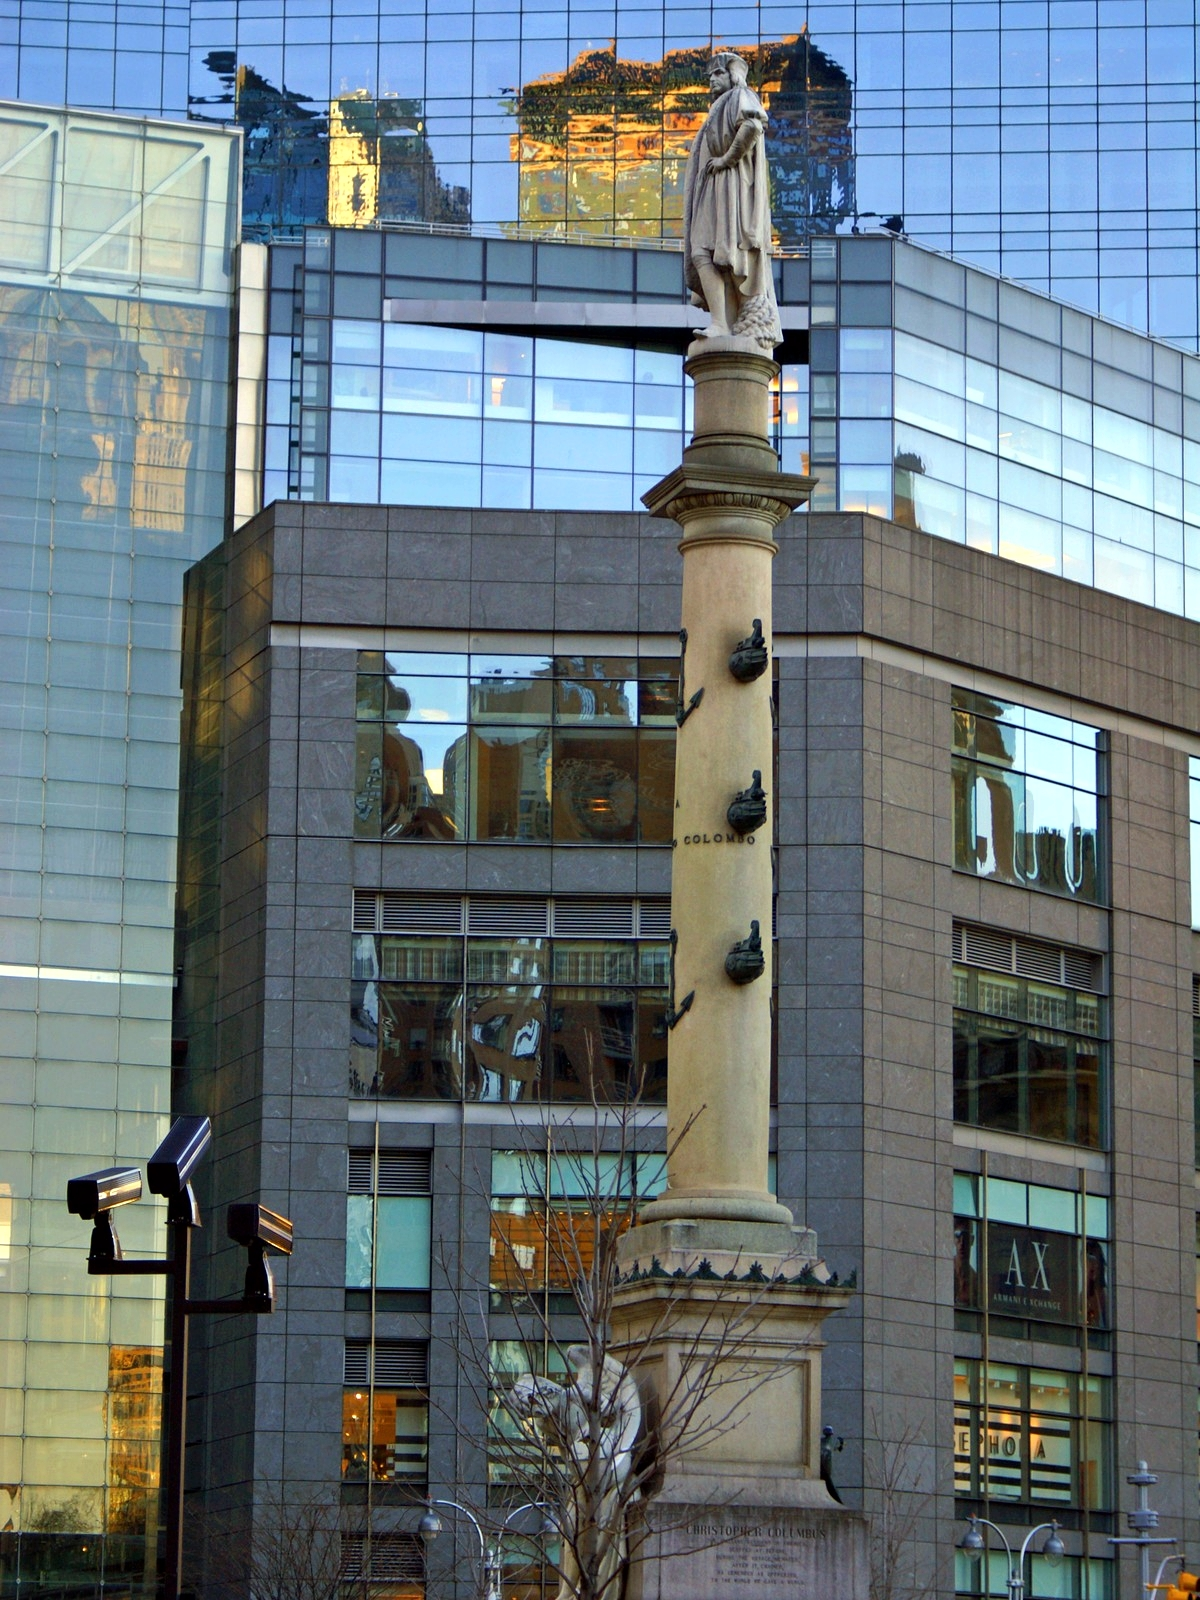 Monumento a cristobal col n nueva york historias de for B b new york centro